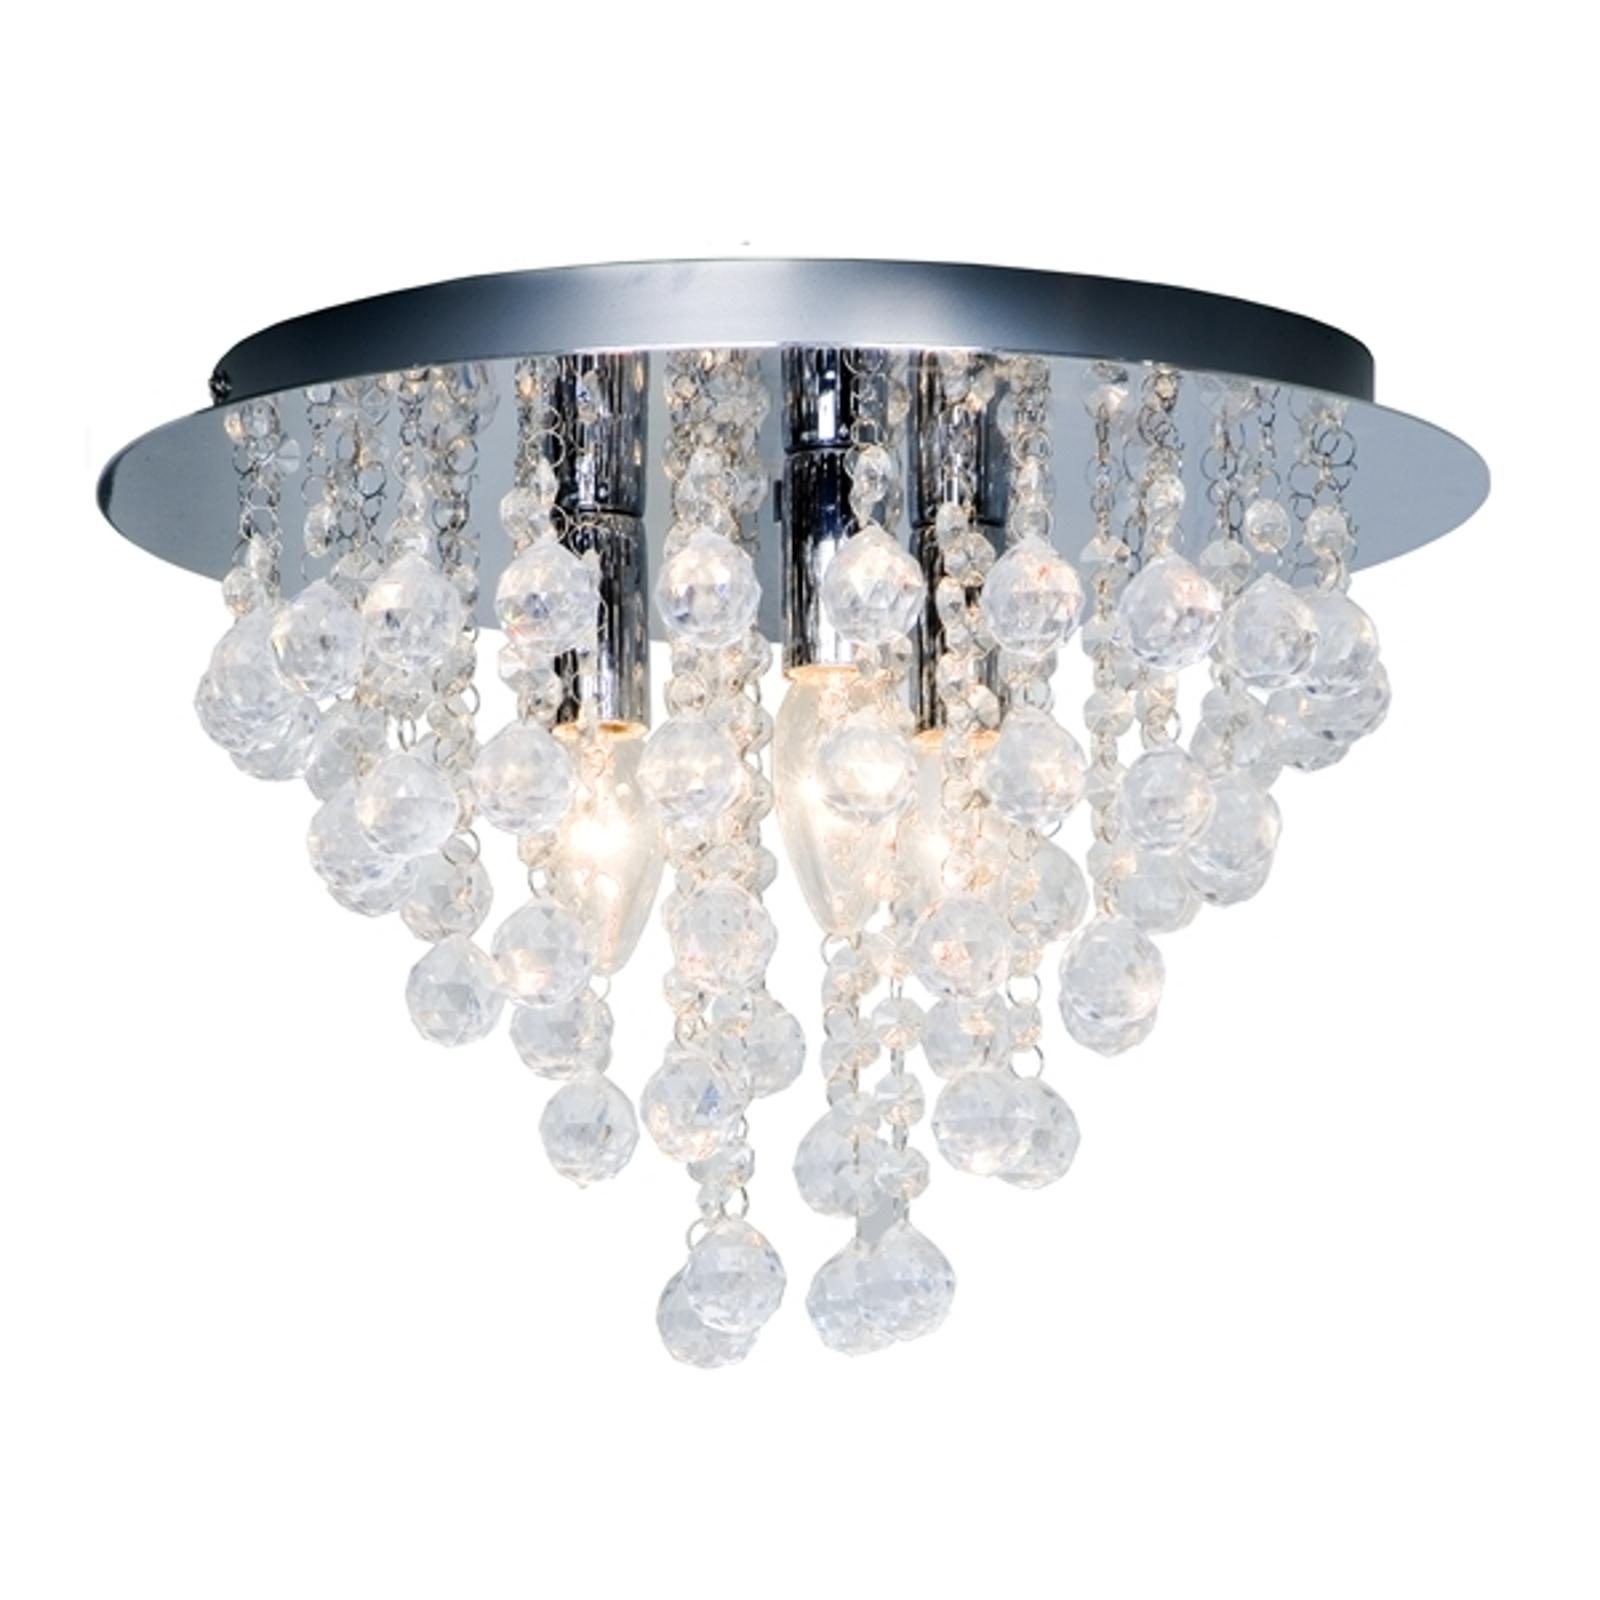 Plafondlamp LONDEN 3-lichts